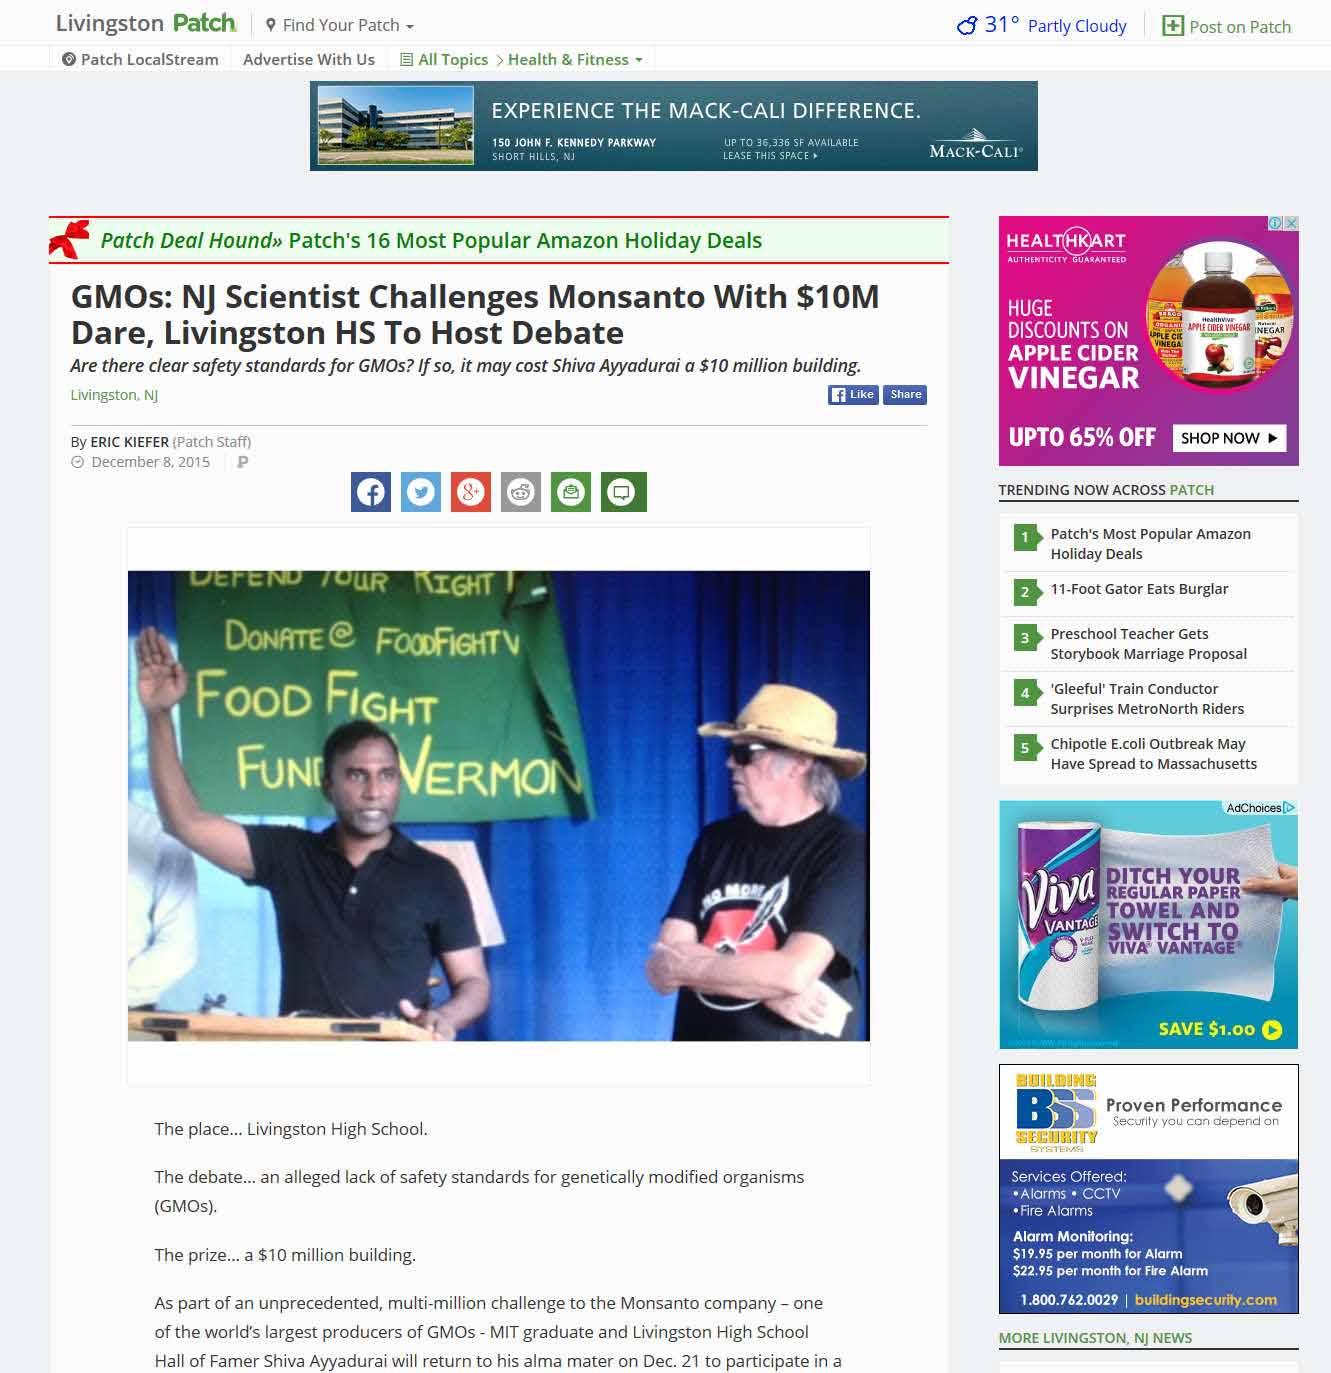 GMOs: NJ Scientist Challenges Monsanto With $10M Dare, Livingston HS To Host Debate